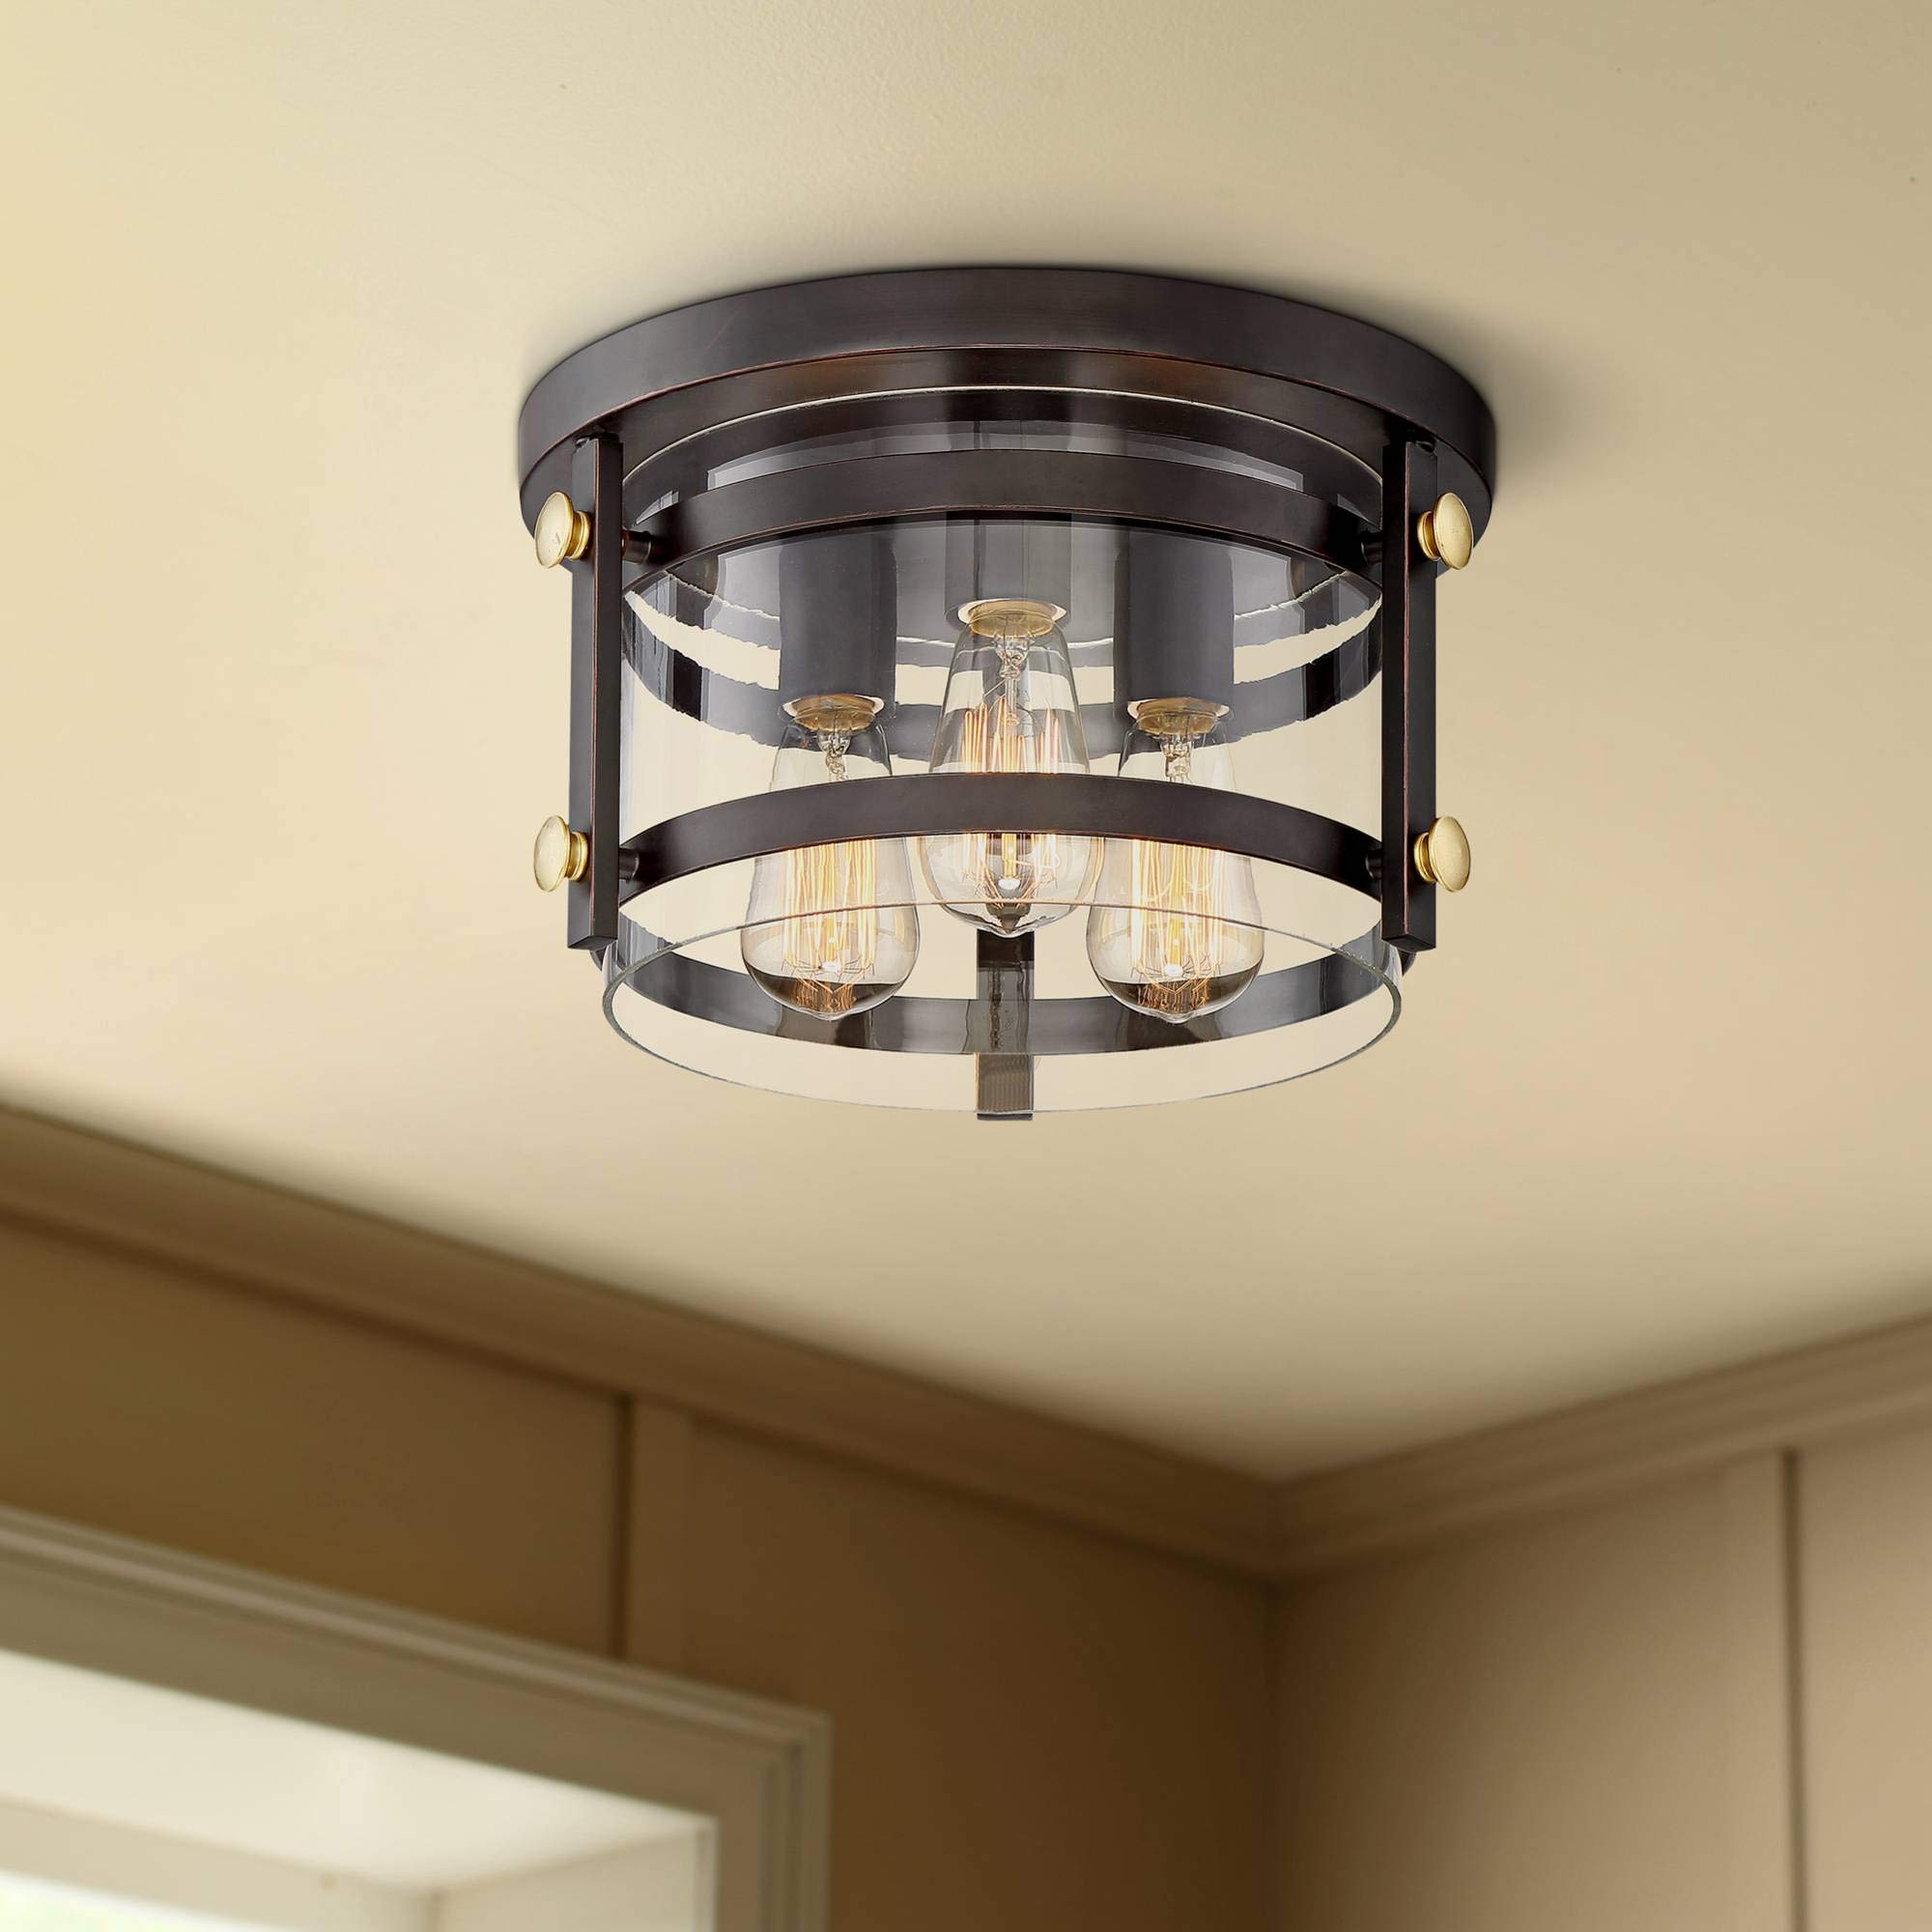 Eagleton 13 1/2'' Wide Oil-Rubbed Bronze LED Ceiling Light - Franklin Iron Works